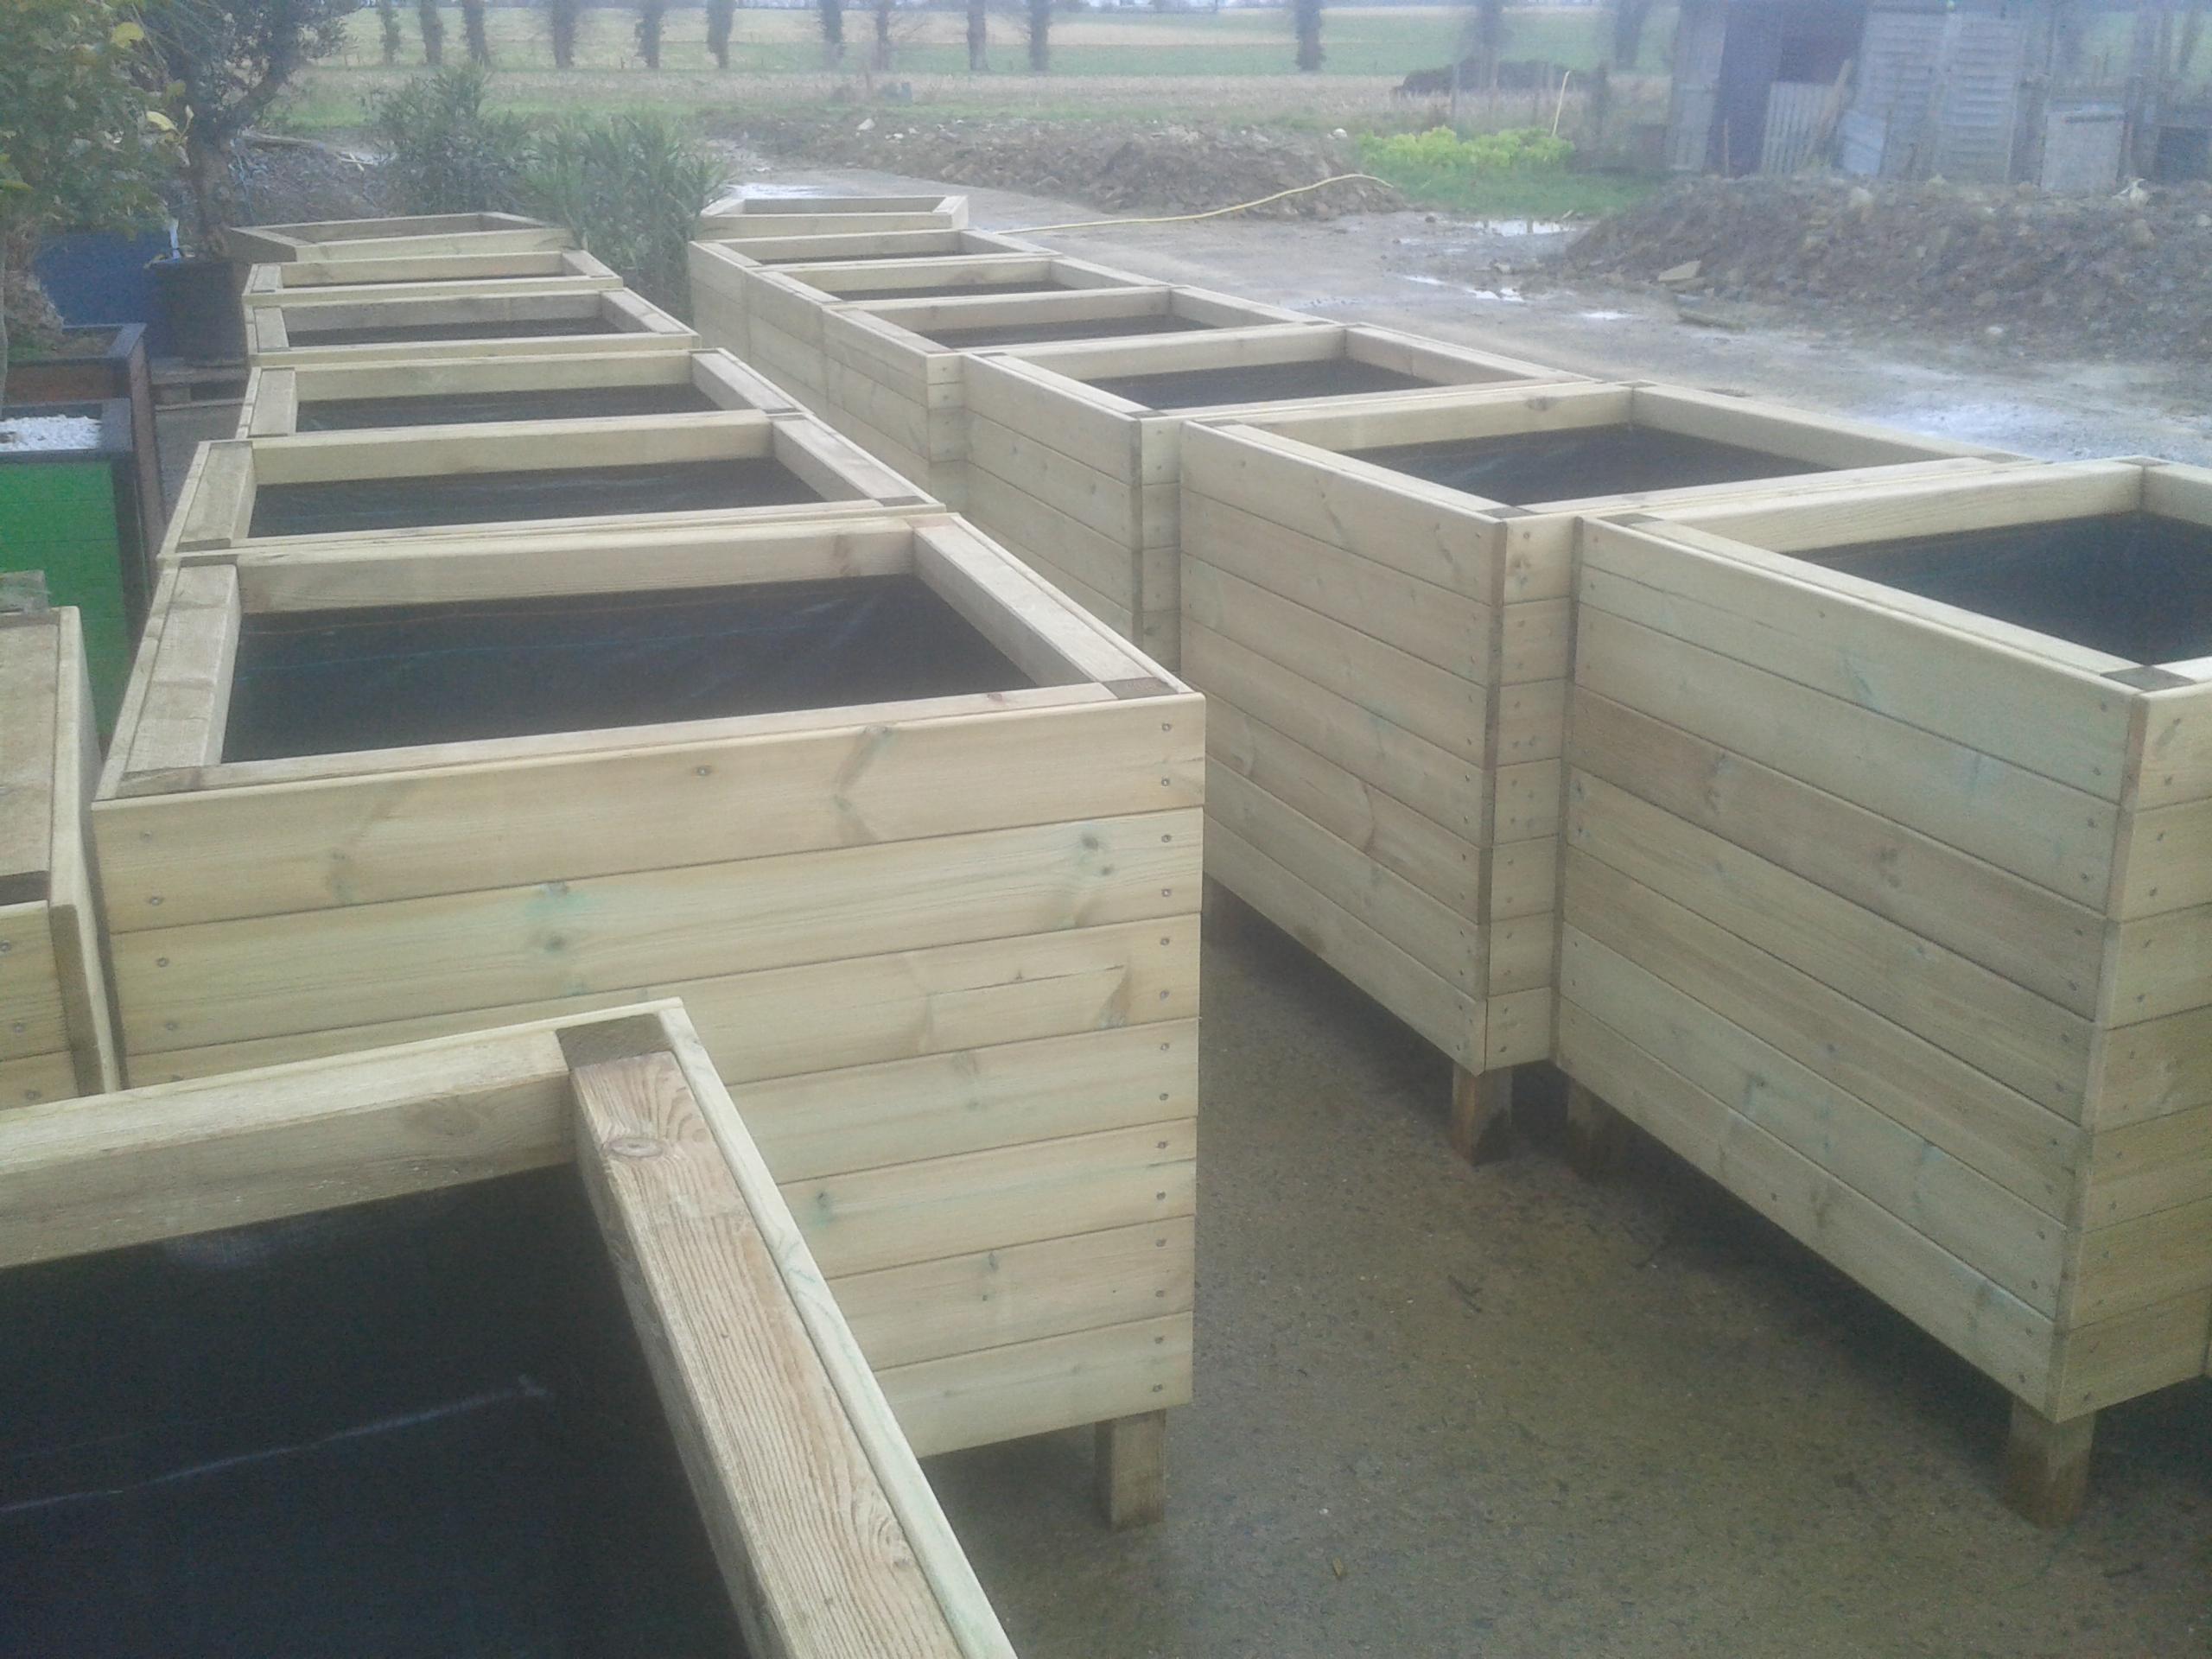 jardini re carr e gros volume 1mx1mx1m 1m3 xxl jardiflo. Black Bedroom Furniture Sets. Home Design Ideas